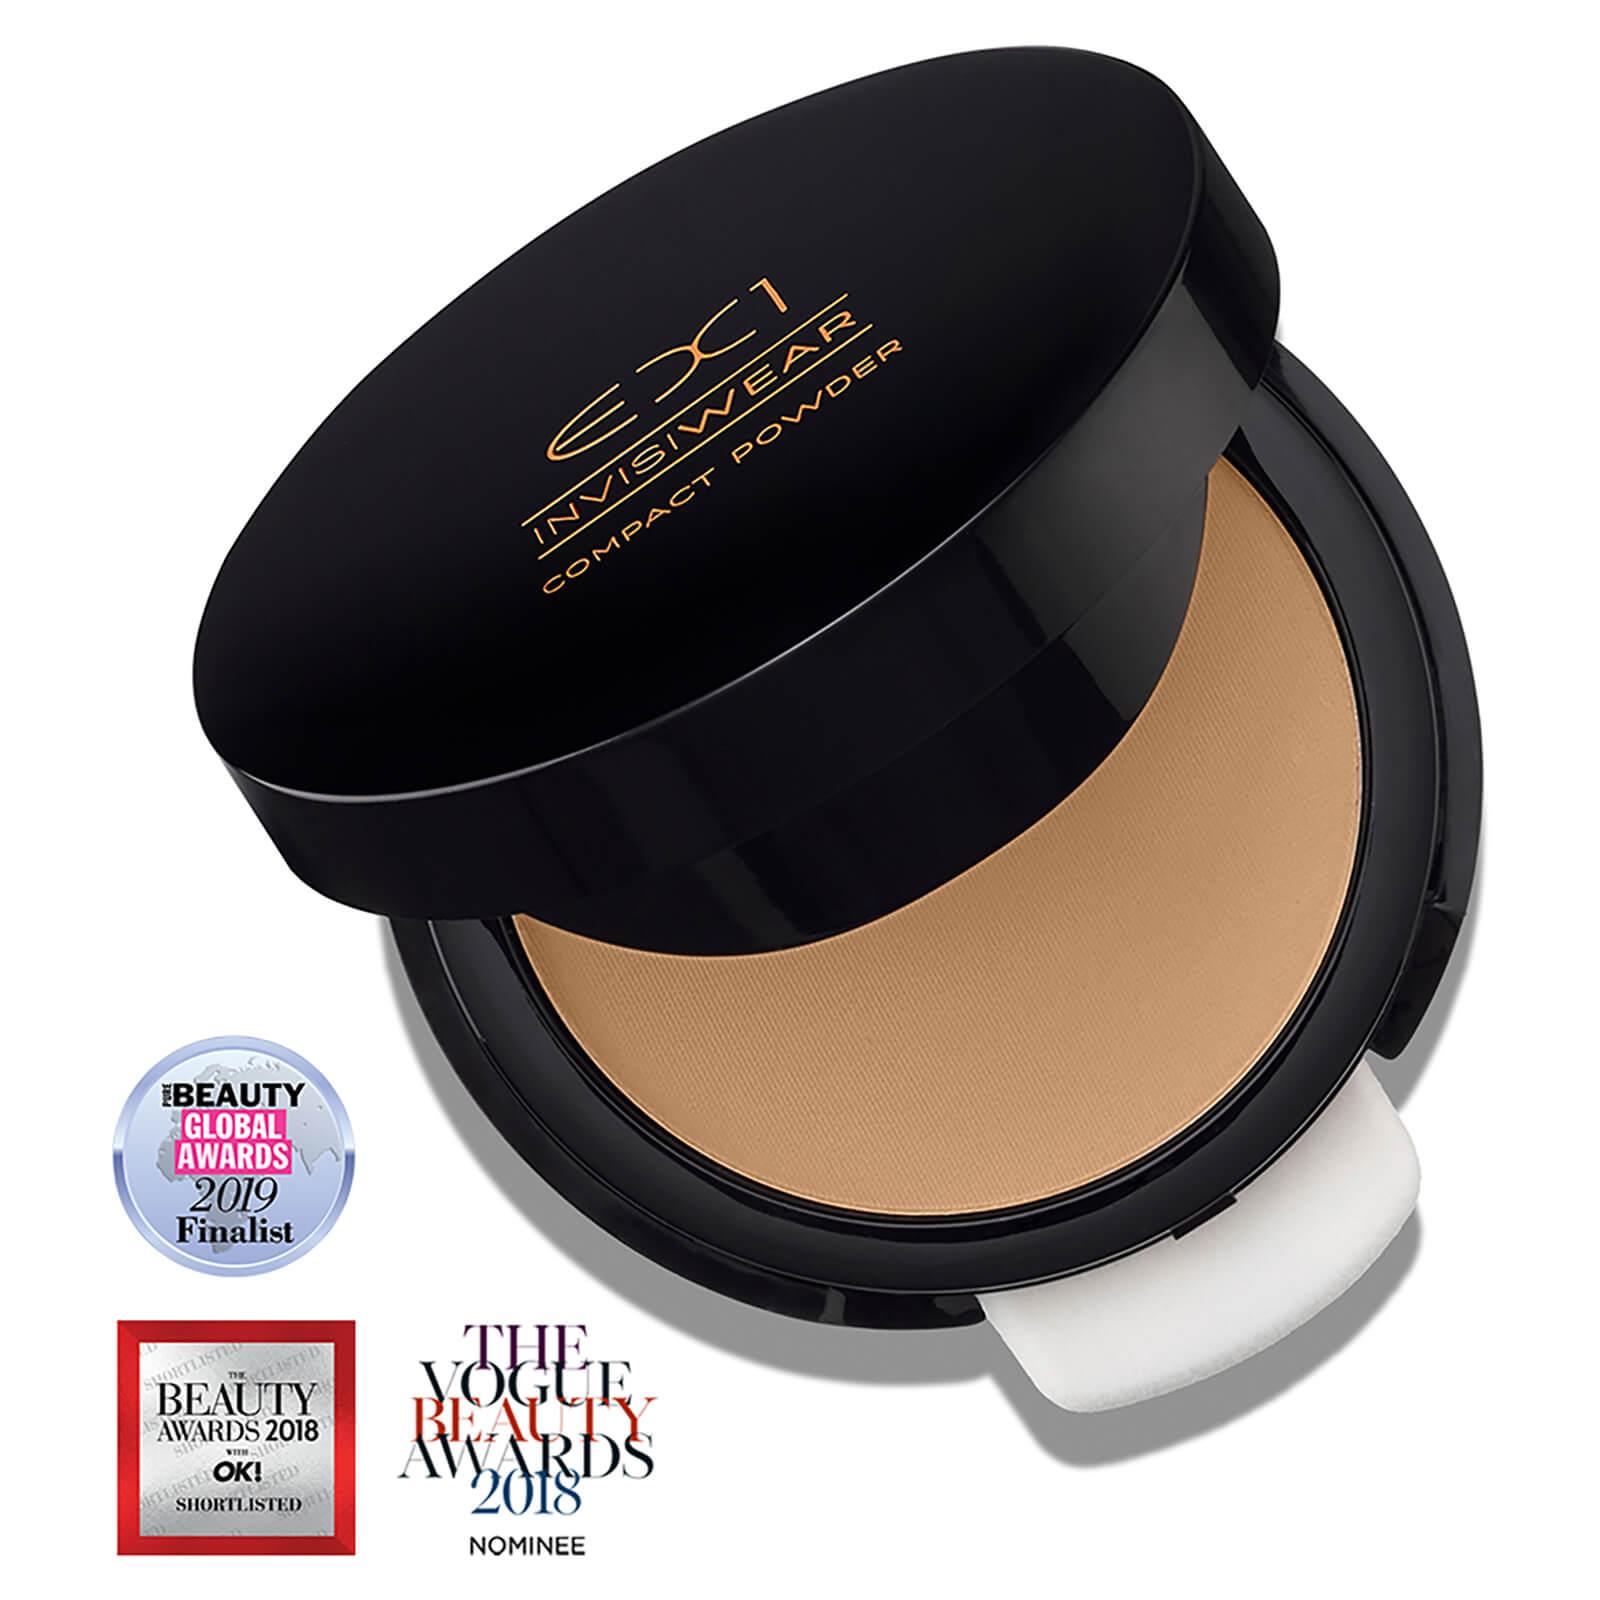 EX1 Cosmetics Compact Powder 9.5g (Various Shades) - 8.0